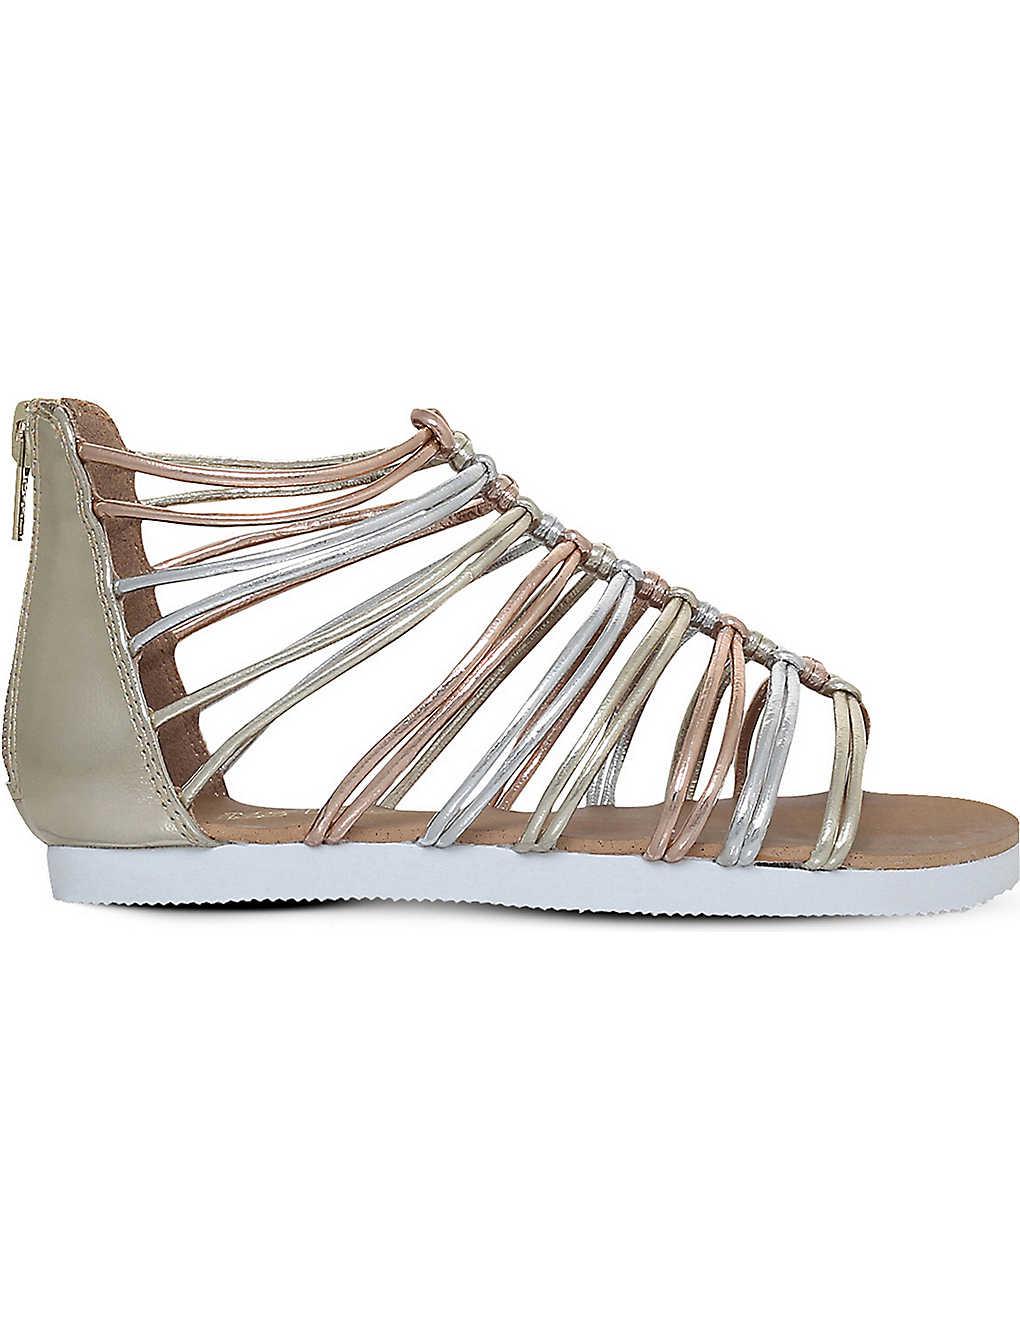 0bfbe38455d0 MINI MISS KG - Rainbow metallic gladiator sandals 3-7 years ...